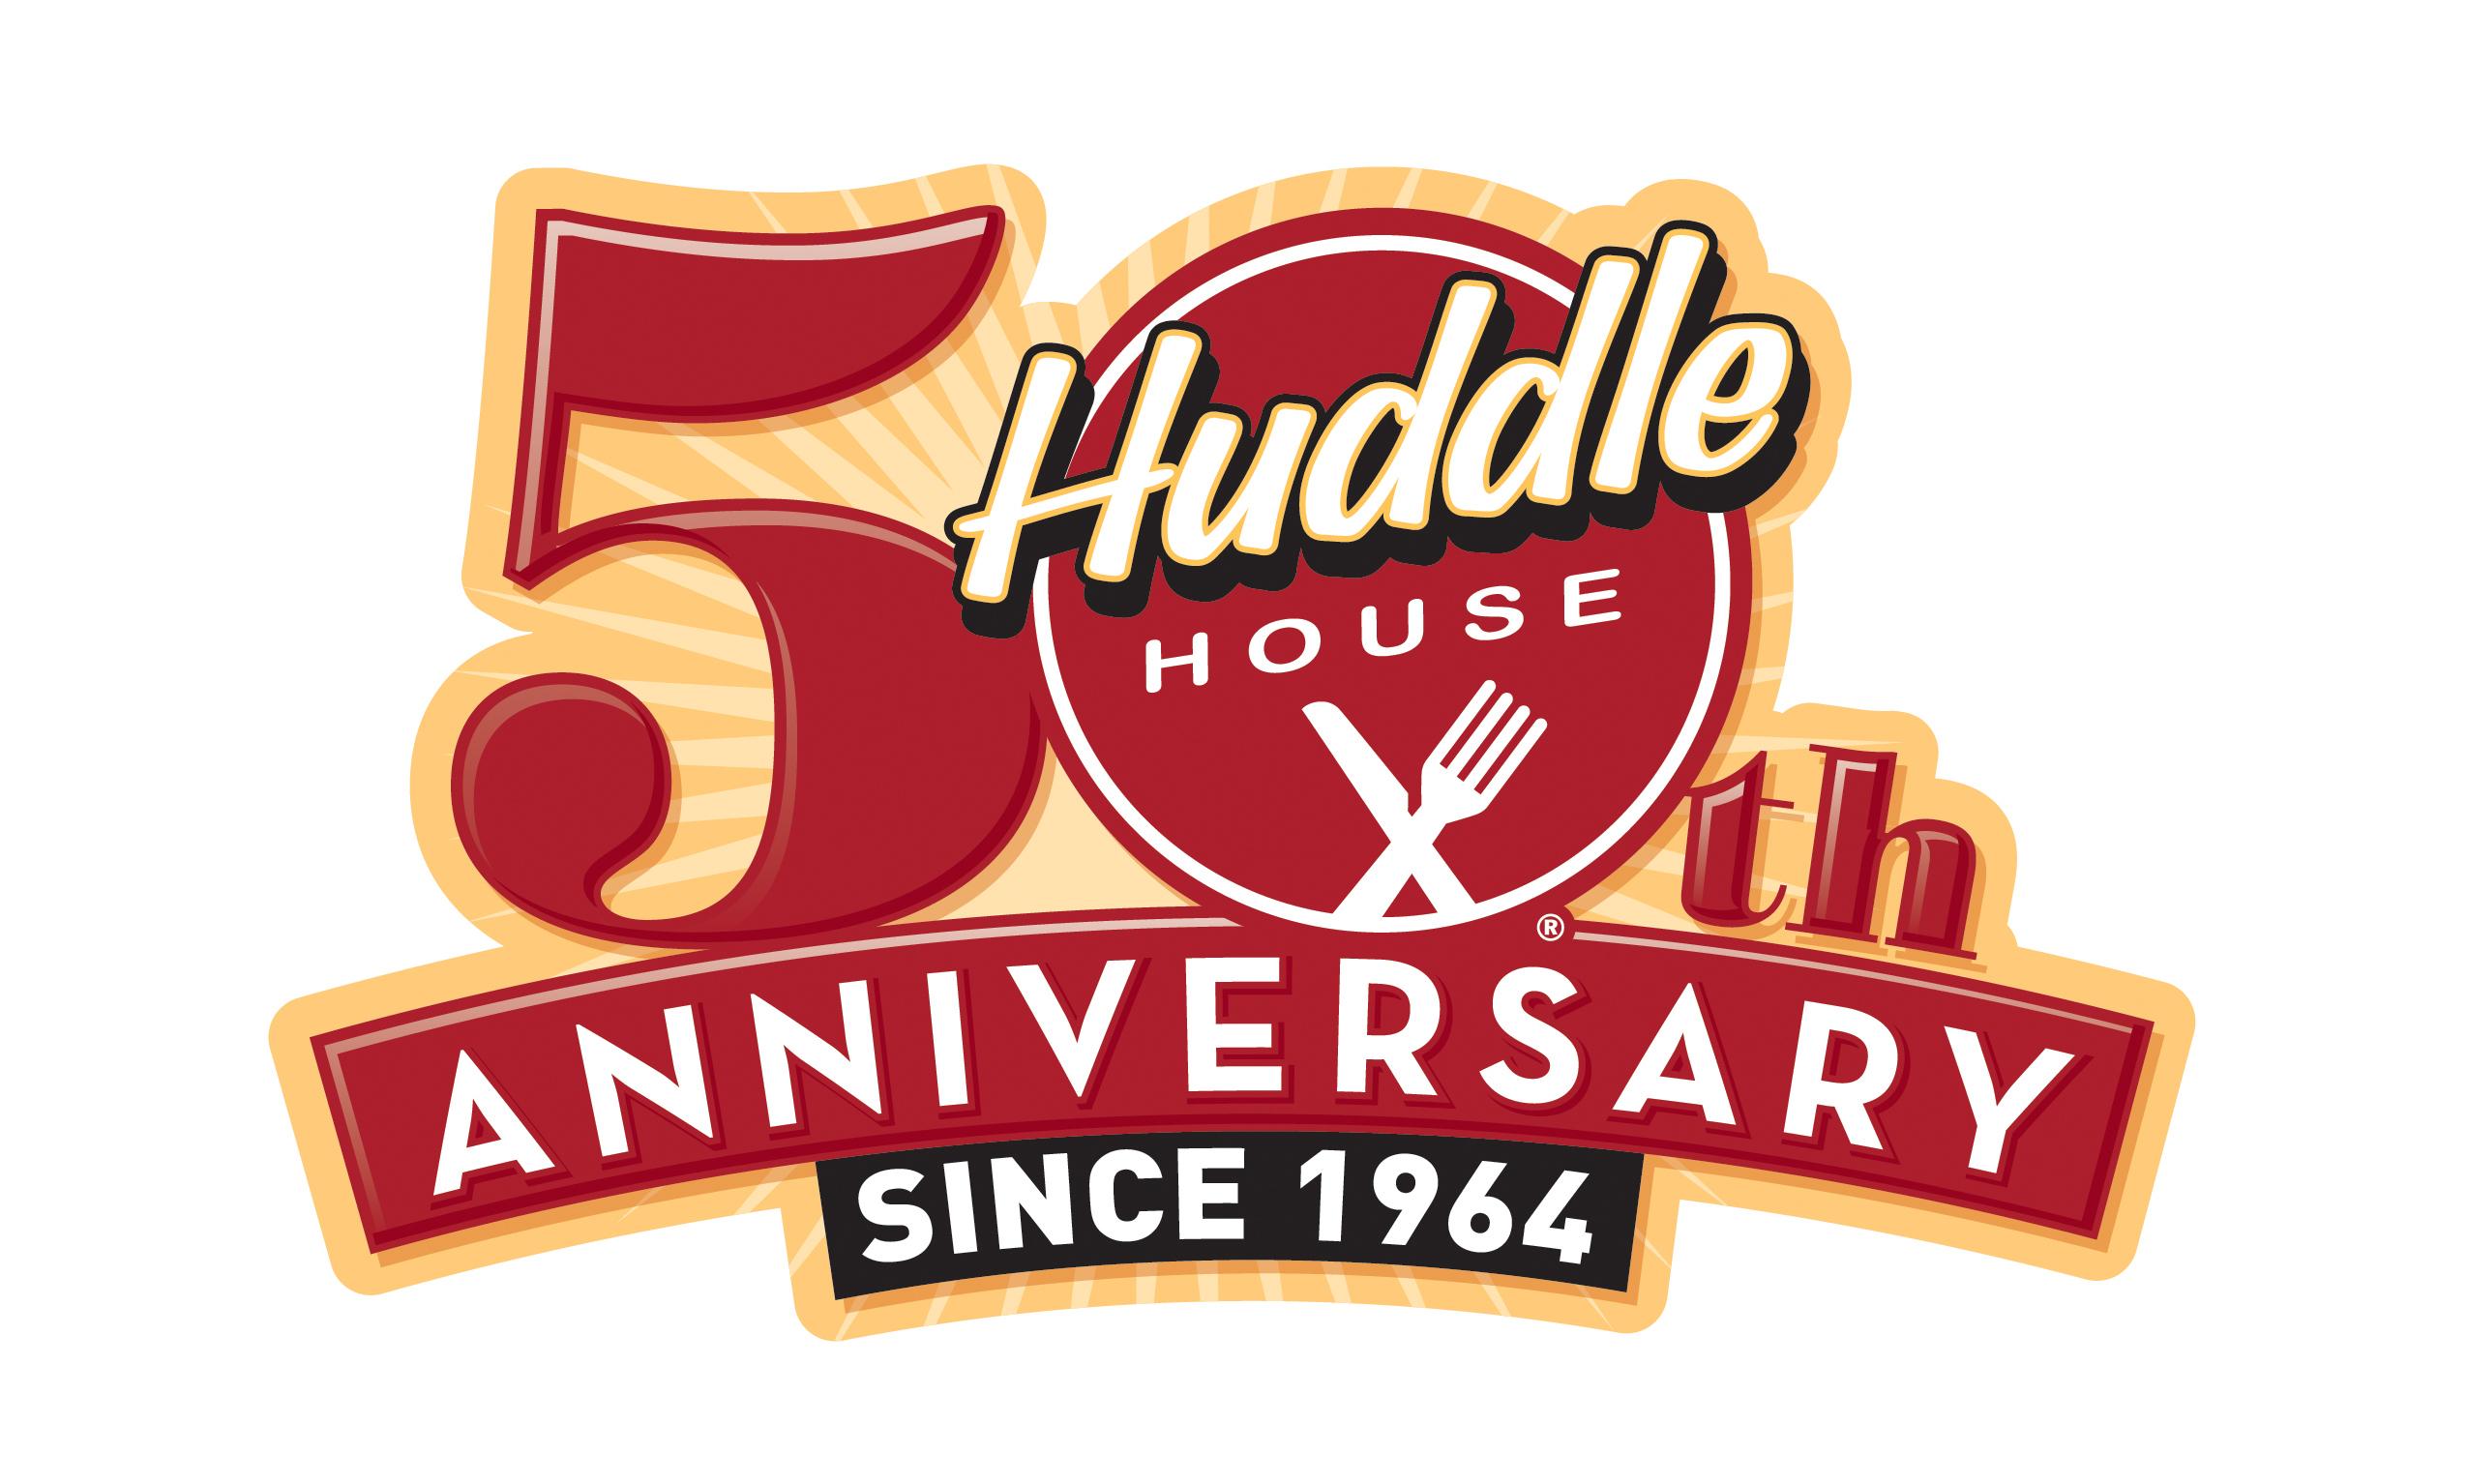 Huddle House Shakes Things Up with New Milk Shake to Celebrate